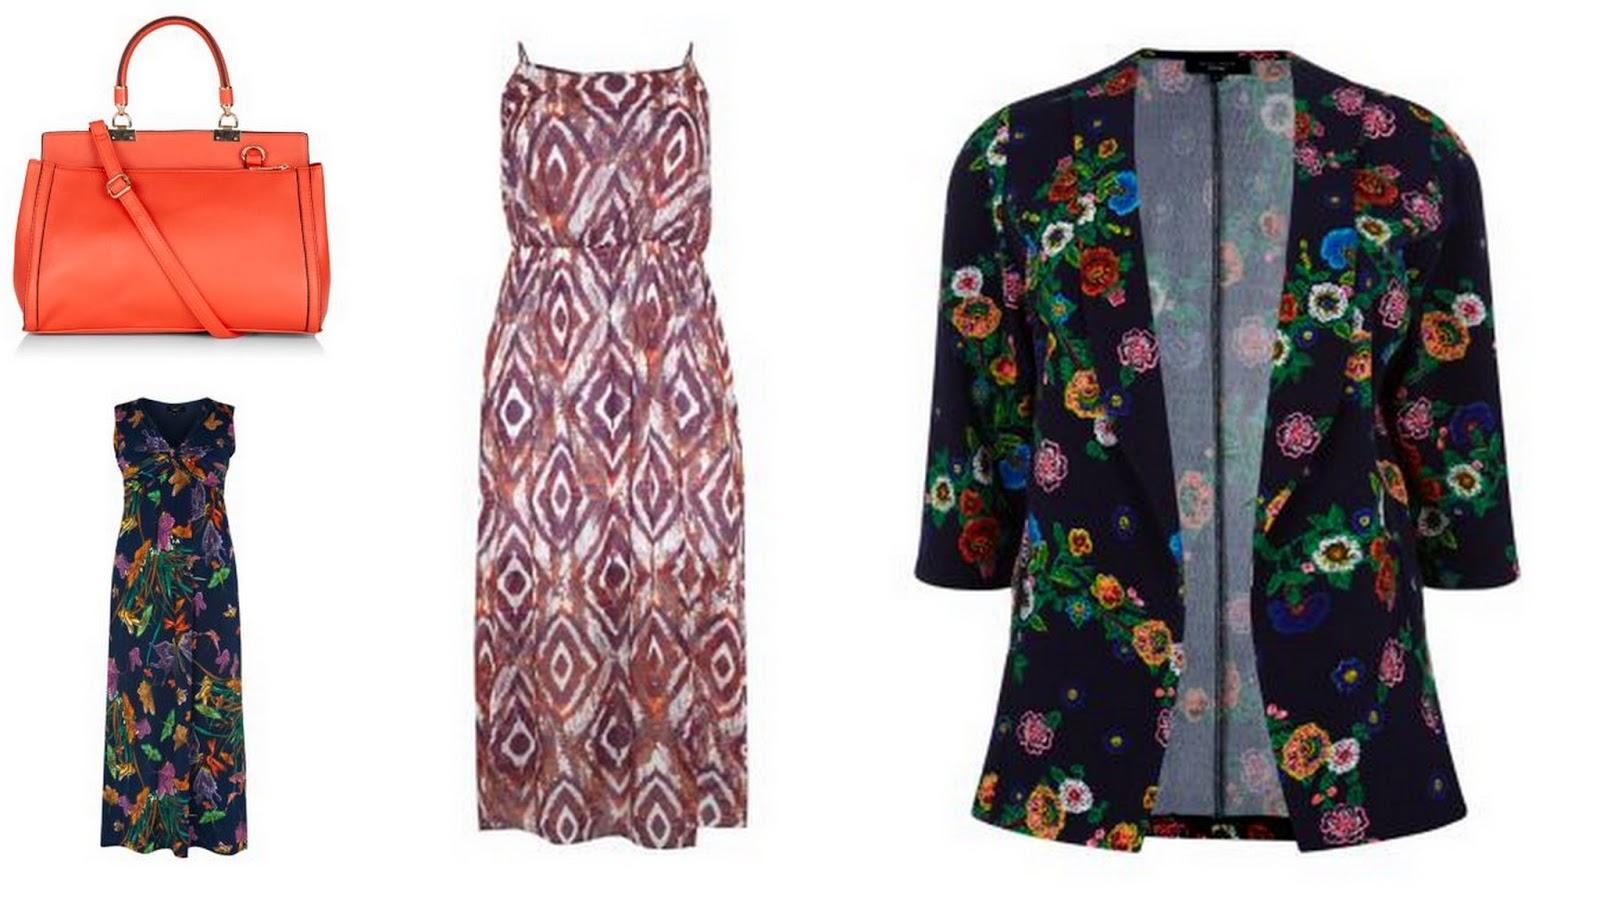 Newlook Inspire Maxi Dress, blazer, new look